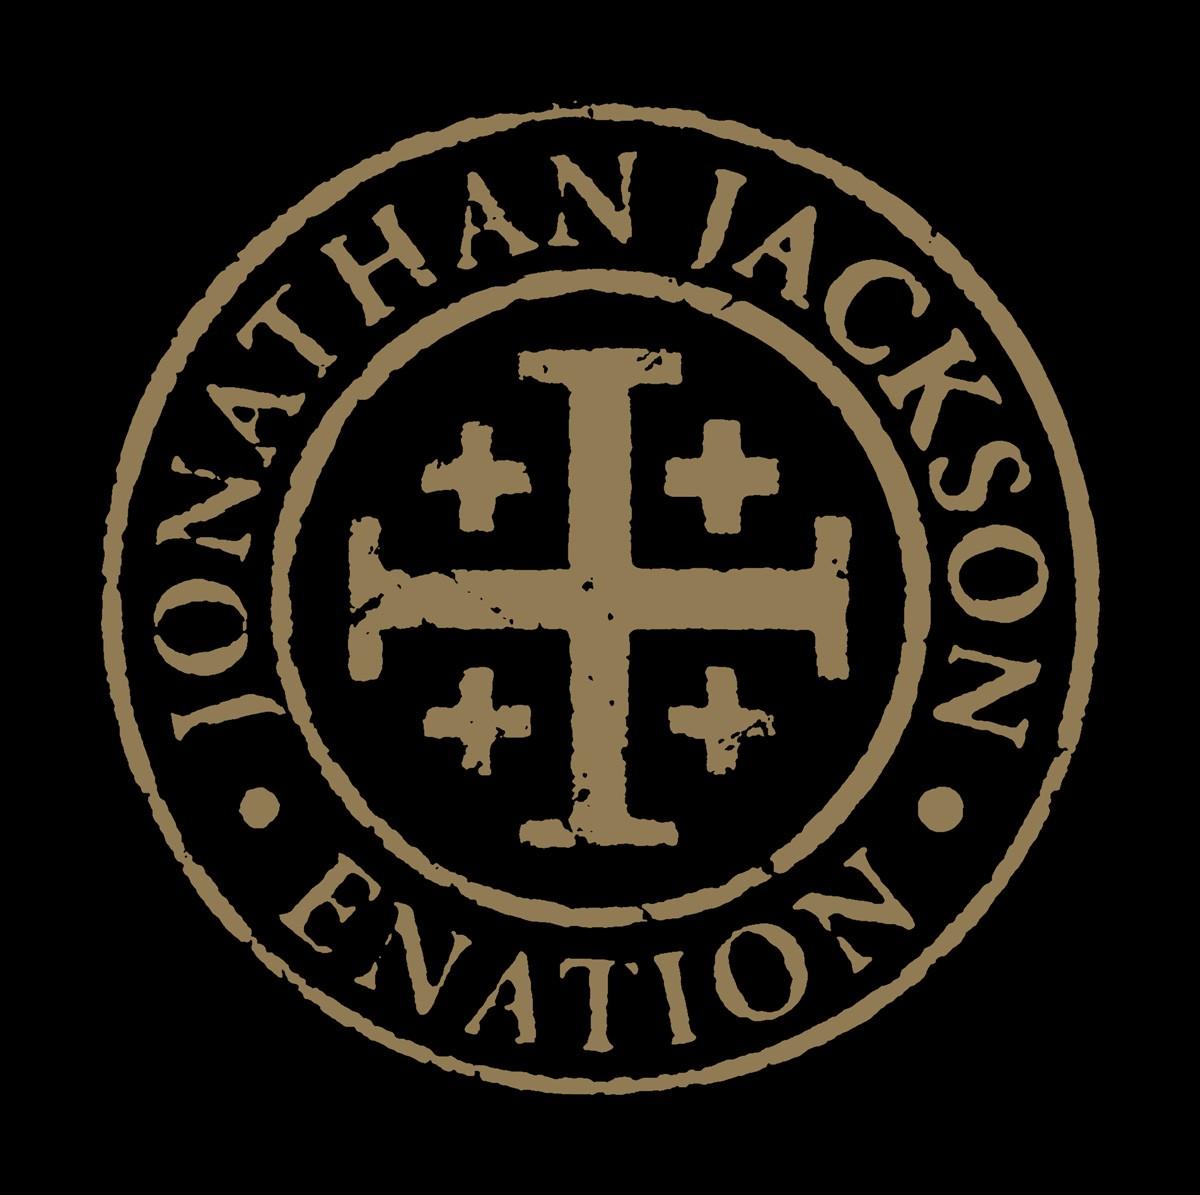 Jonathan Jackson + Enation